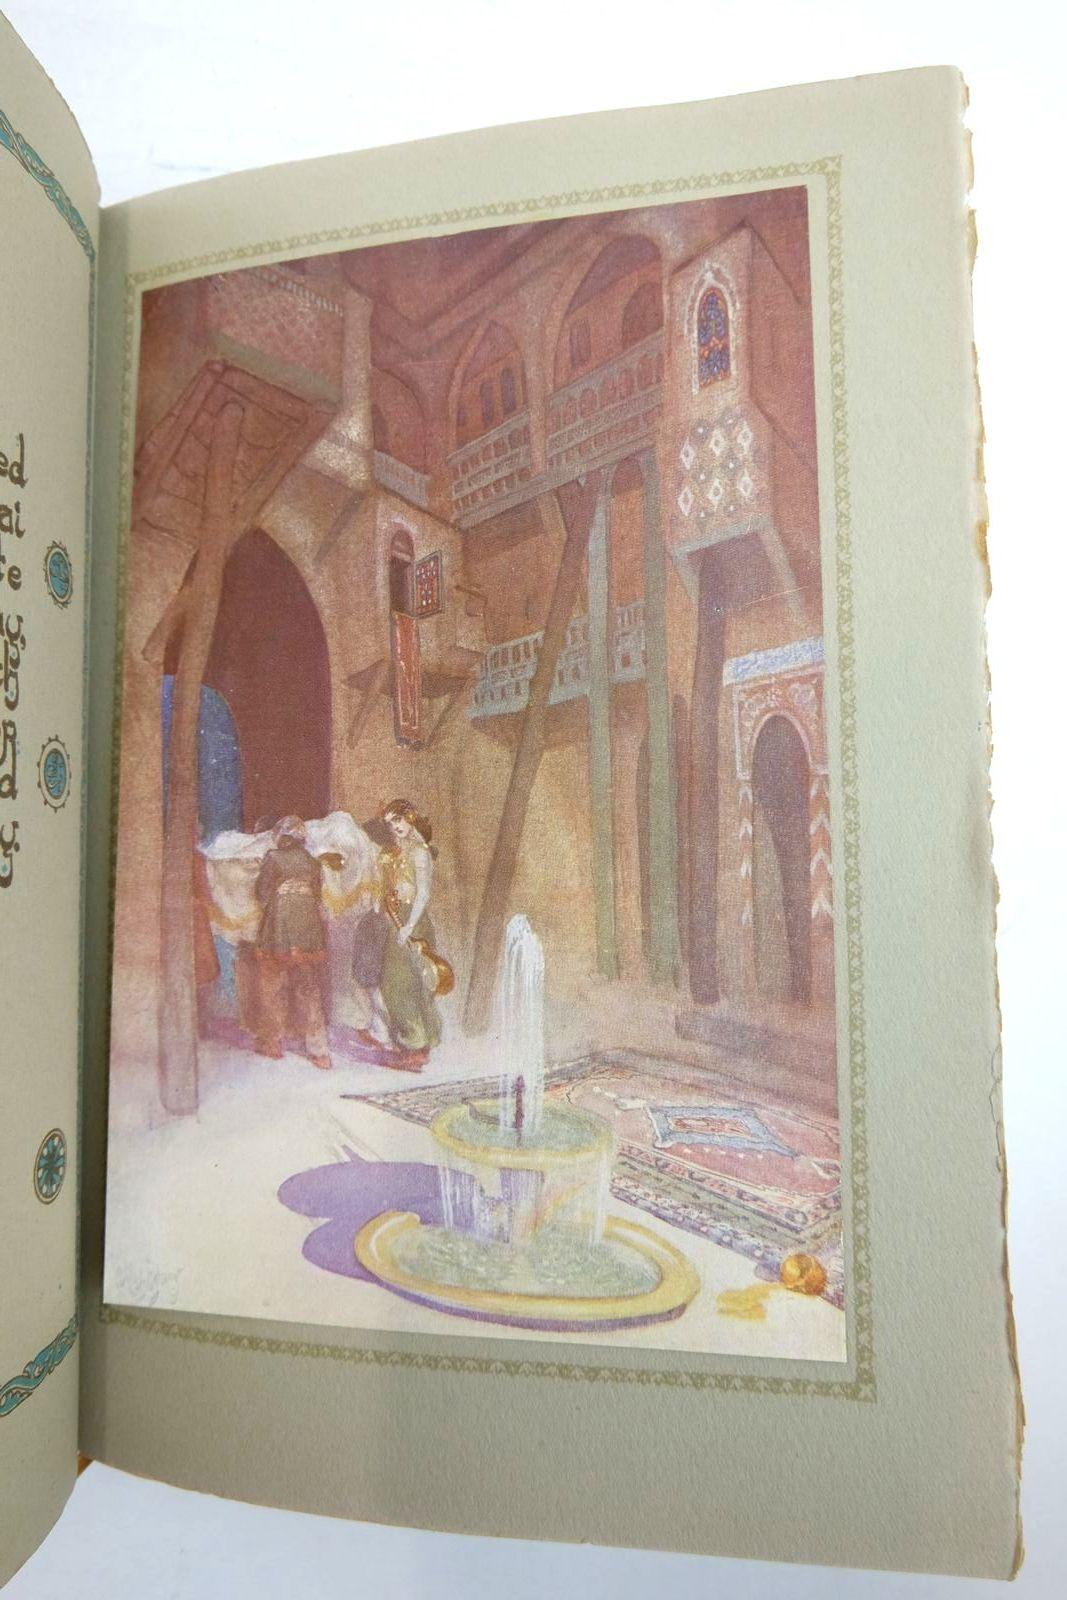 Photo of RUBAIYAT OF OMAR KHAYYAM written by Khayyam, Omar Fitzgerald, Edward illustrated by Pogany, Willy published by George G. Harrap & Co. Ltd. (STOCK CODE: 2134714)  for sale by Stella & Rose's Books